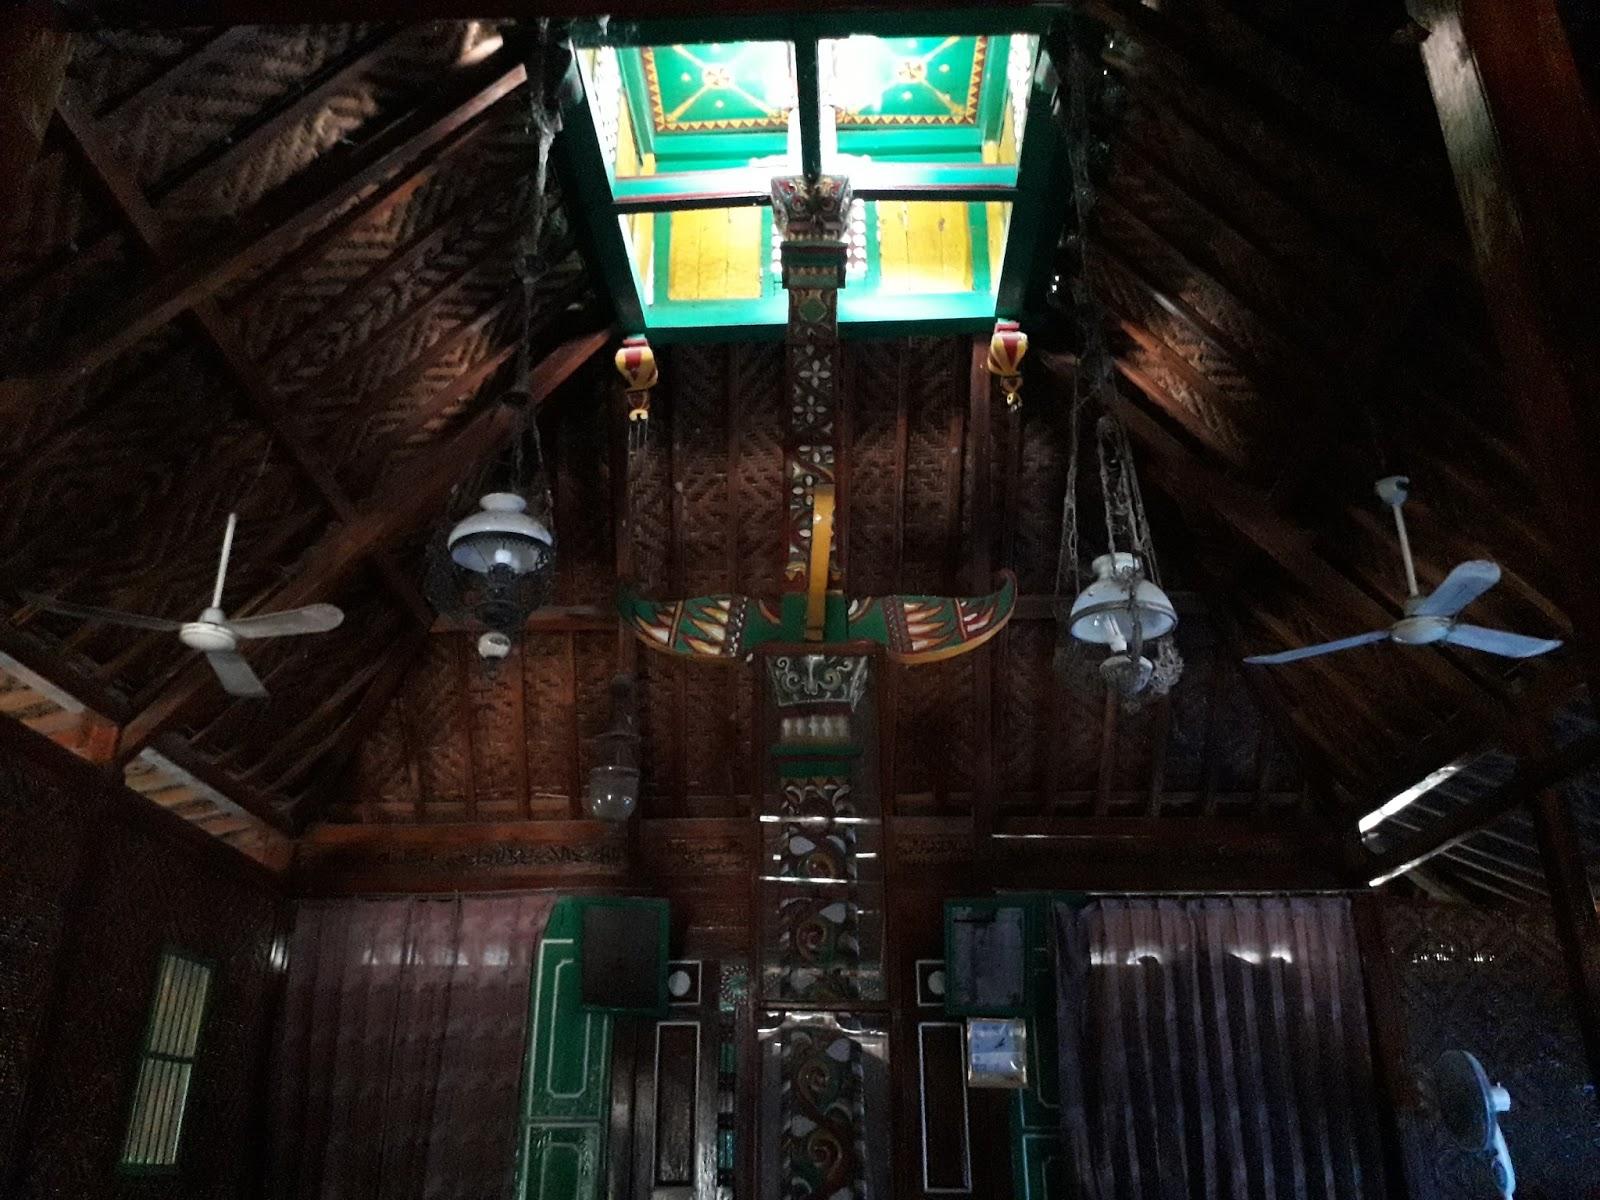 Masjid Tertua Indonesia Abasozora Saka Tunggal Baitussalam Berada Desa Cikakak